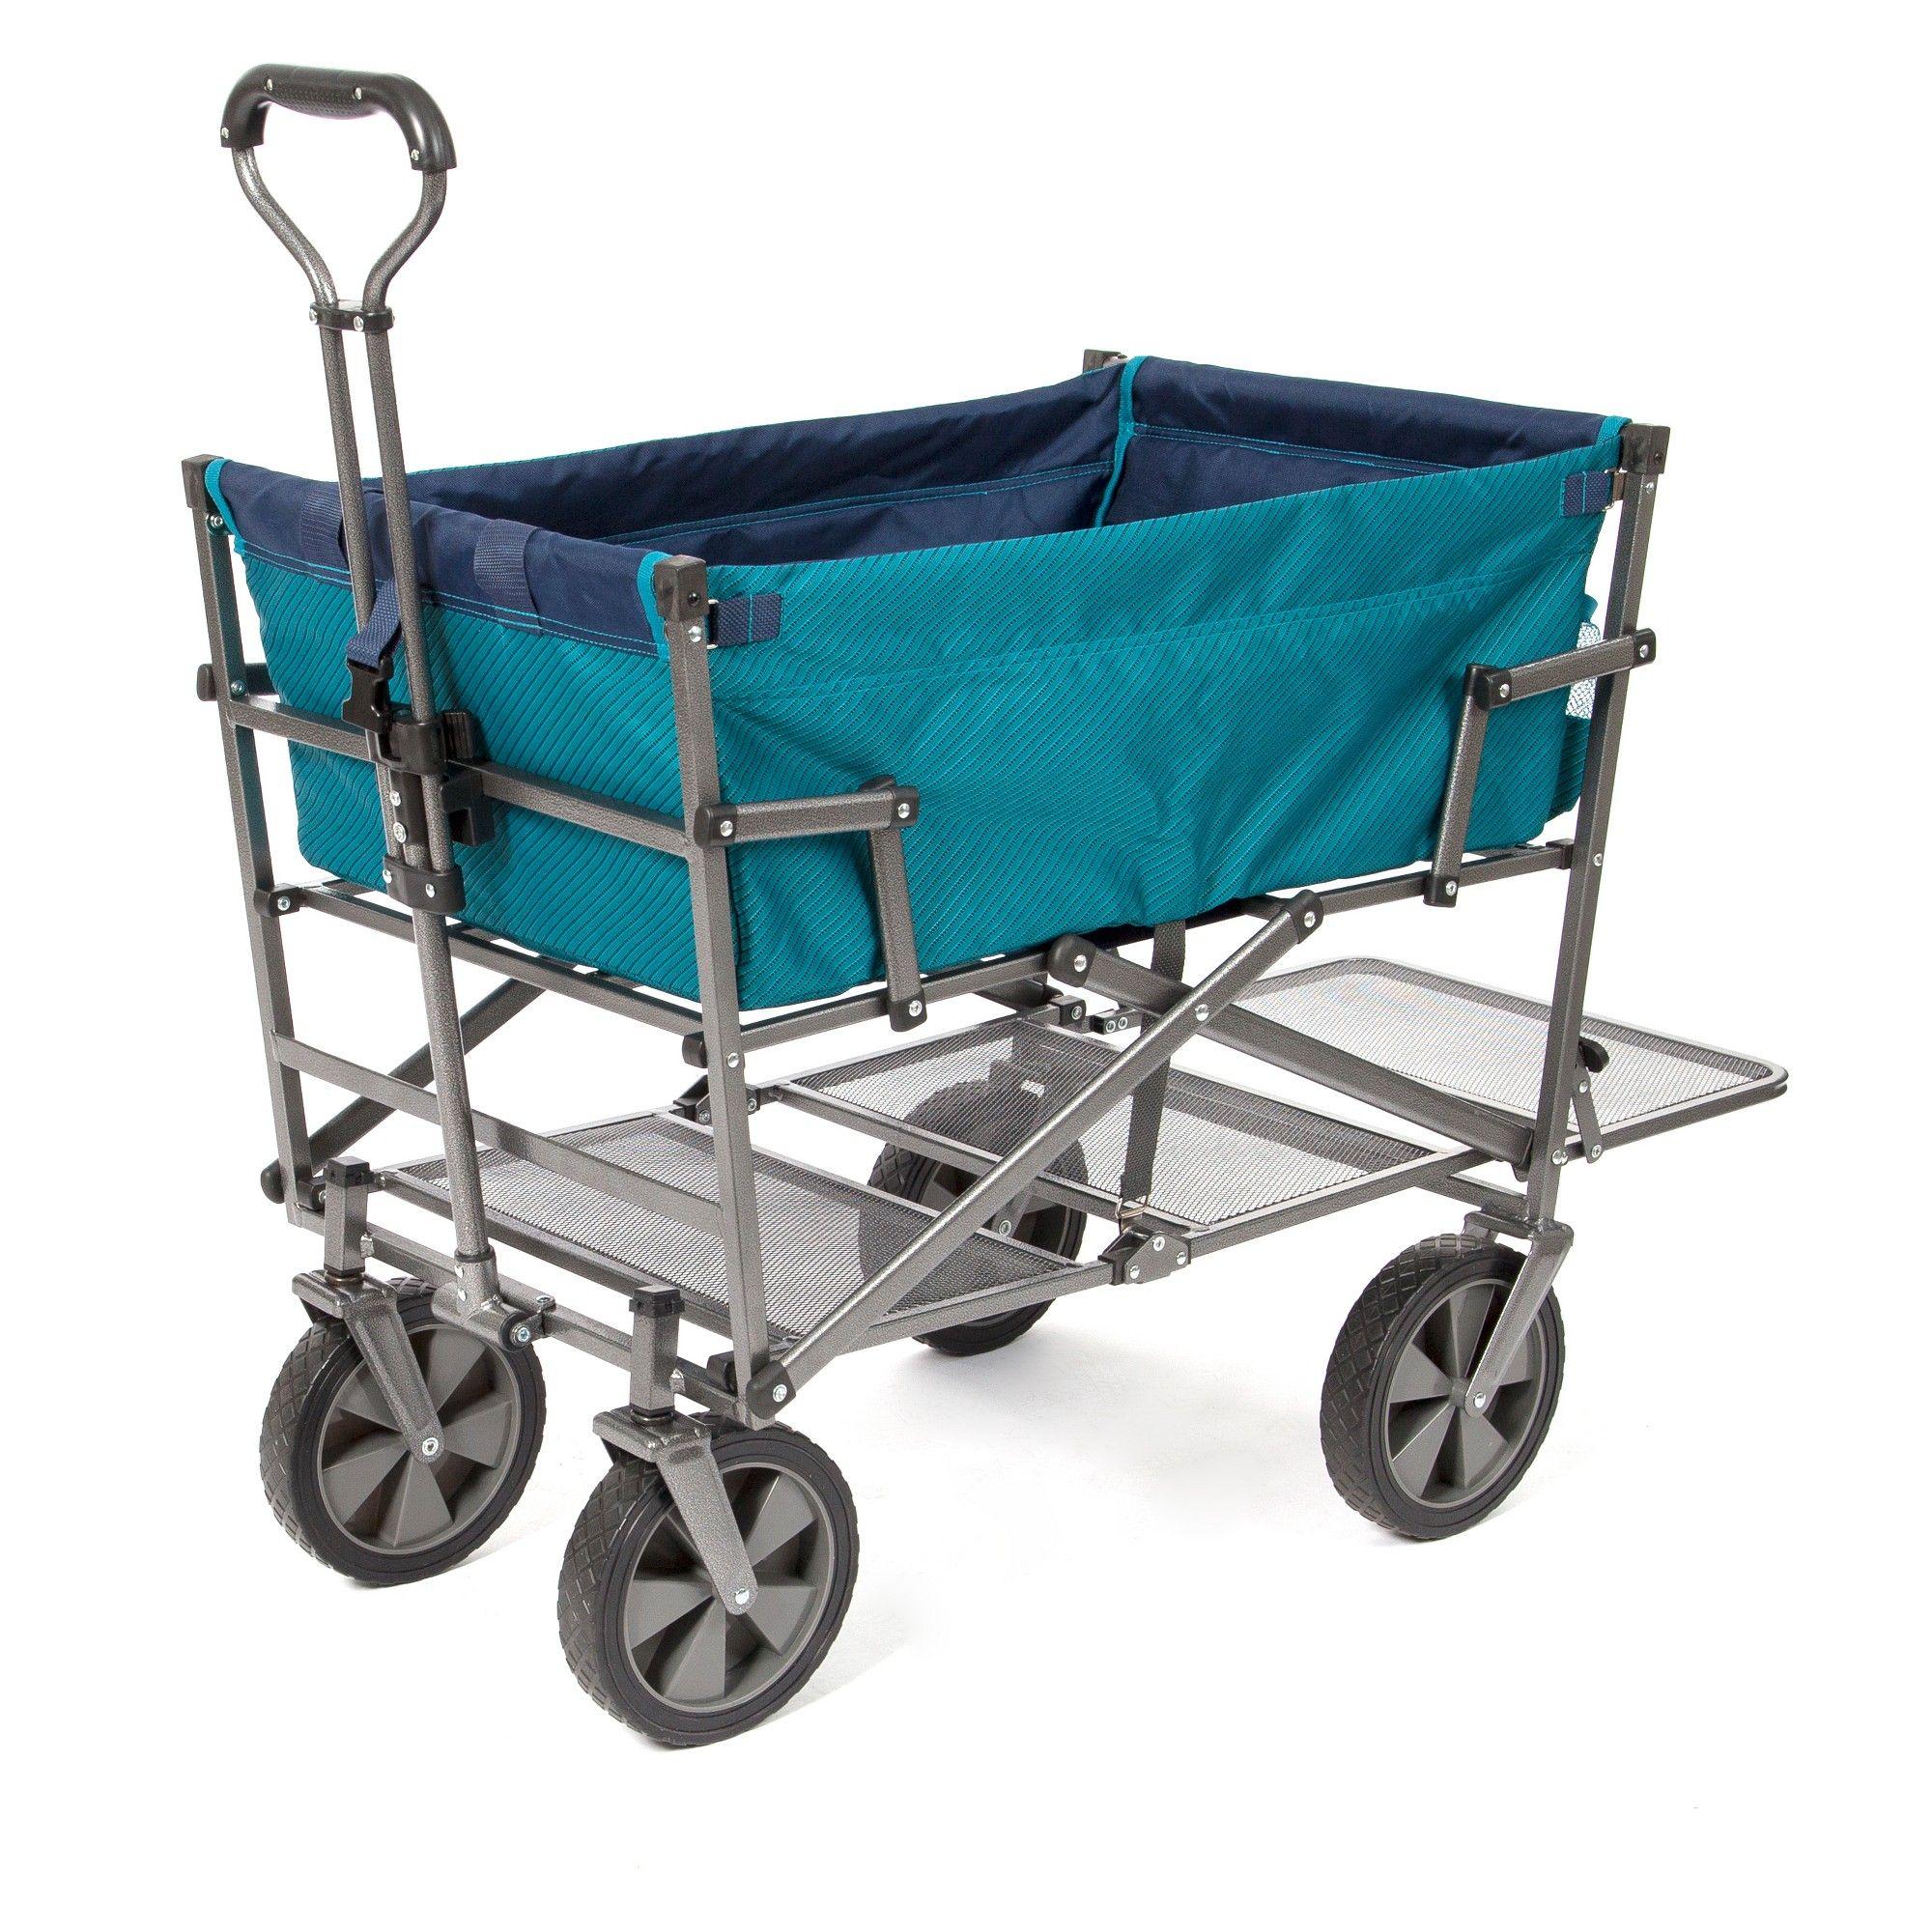 Mac Sports Double Decker Wagon Teal Folding Wagon Utility